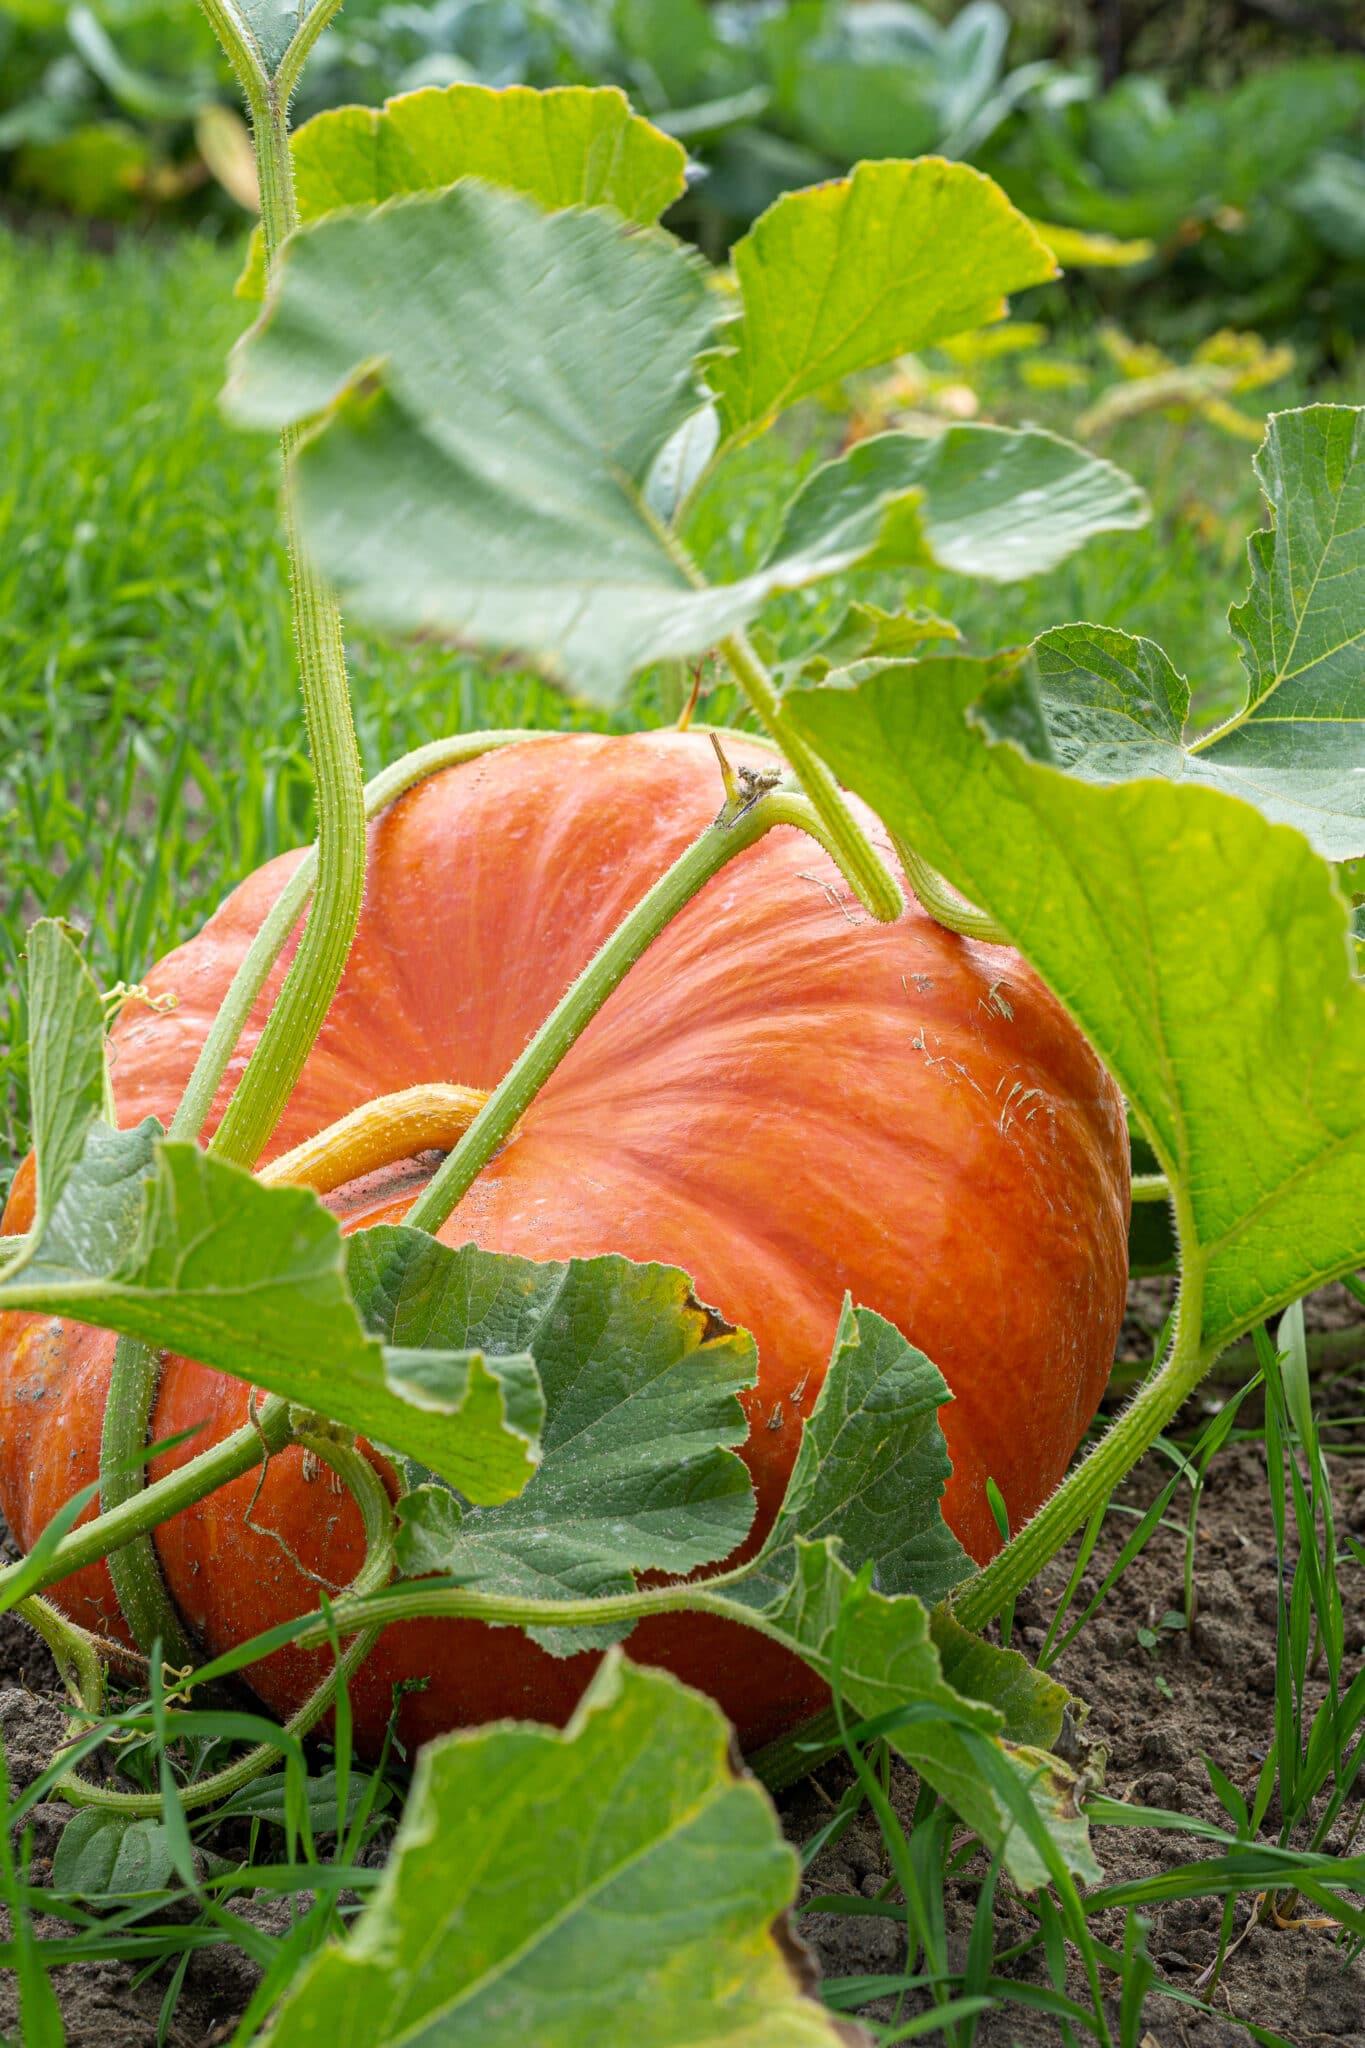 A medium sized pumpkin ripening on the ground.